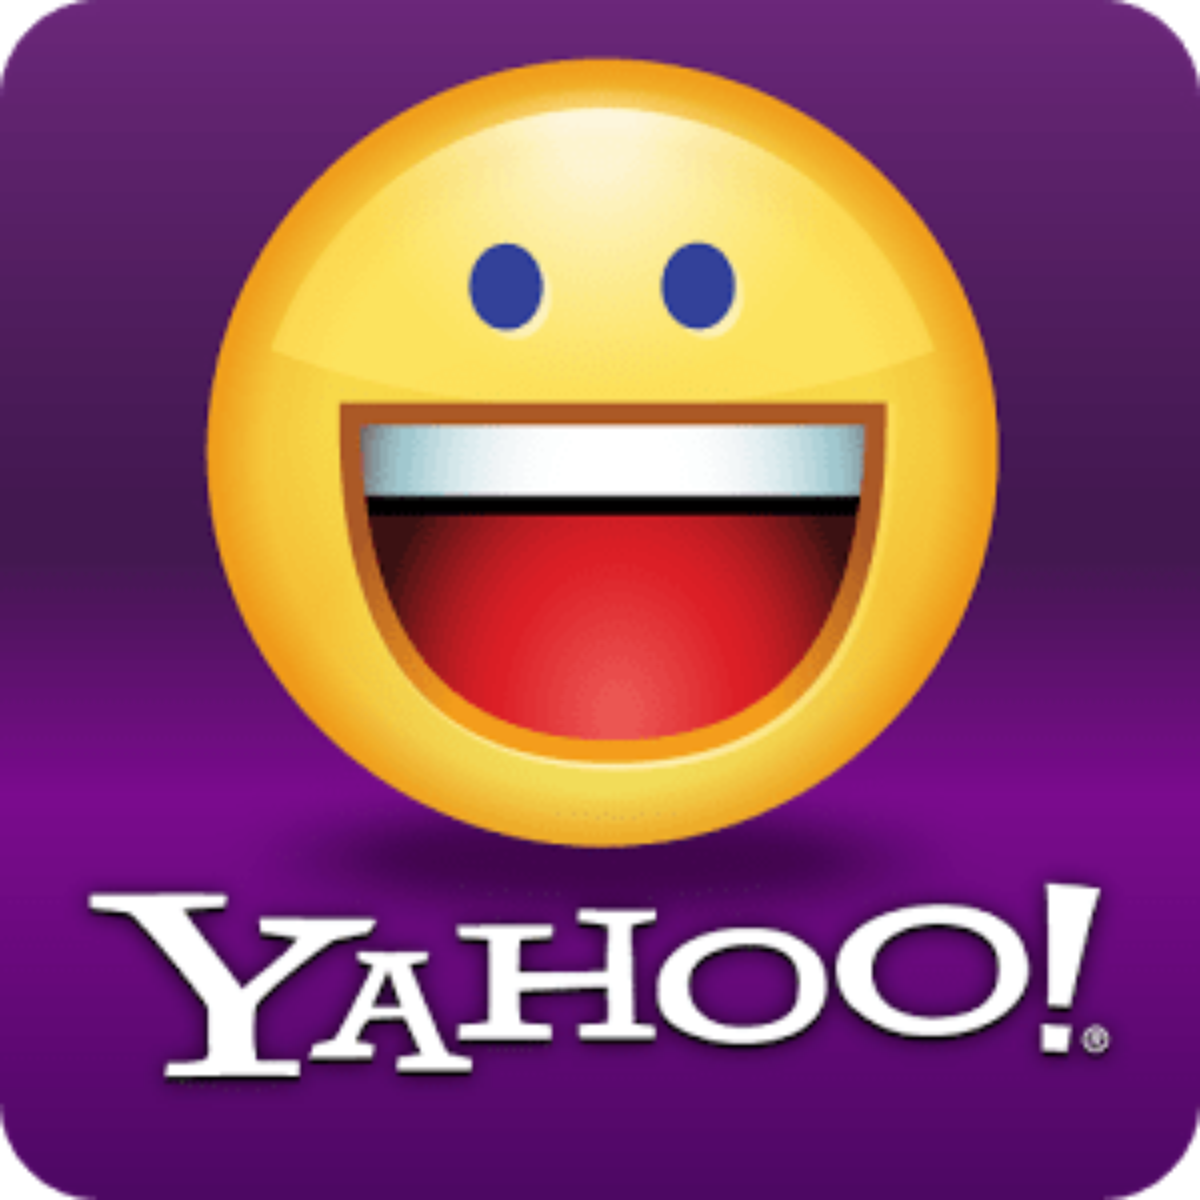 Yahoo! Messenger 2.0.4